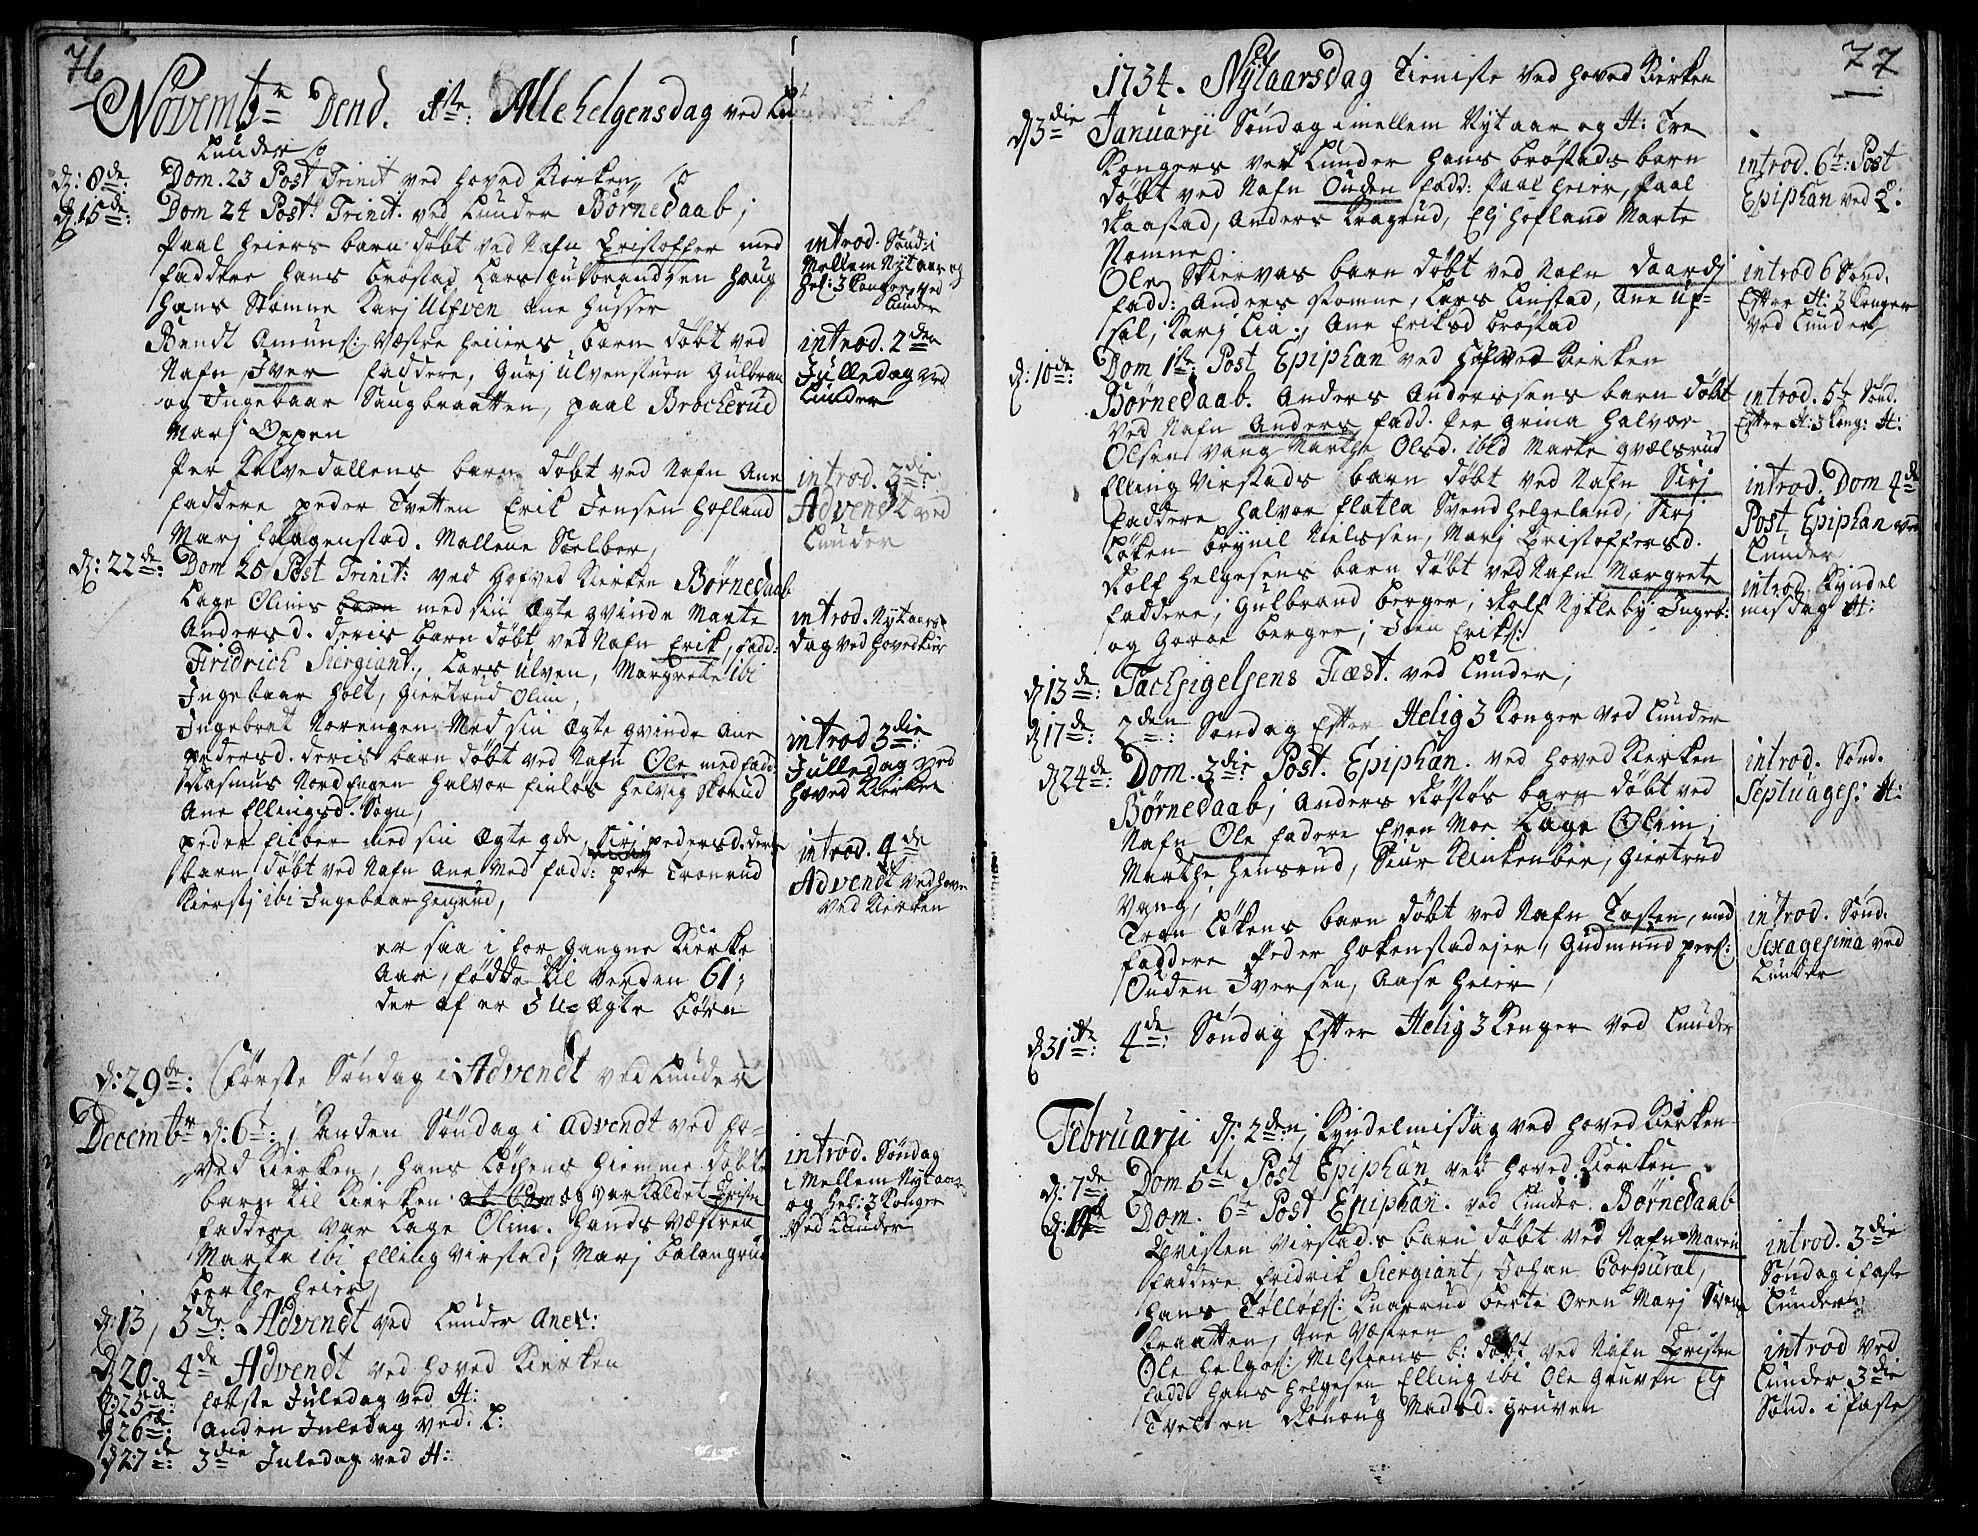 SAH, Jevnaker prestekontor, Ministerialbok nr. 2, 1725-1751, s. 76-77